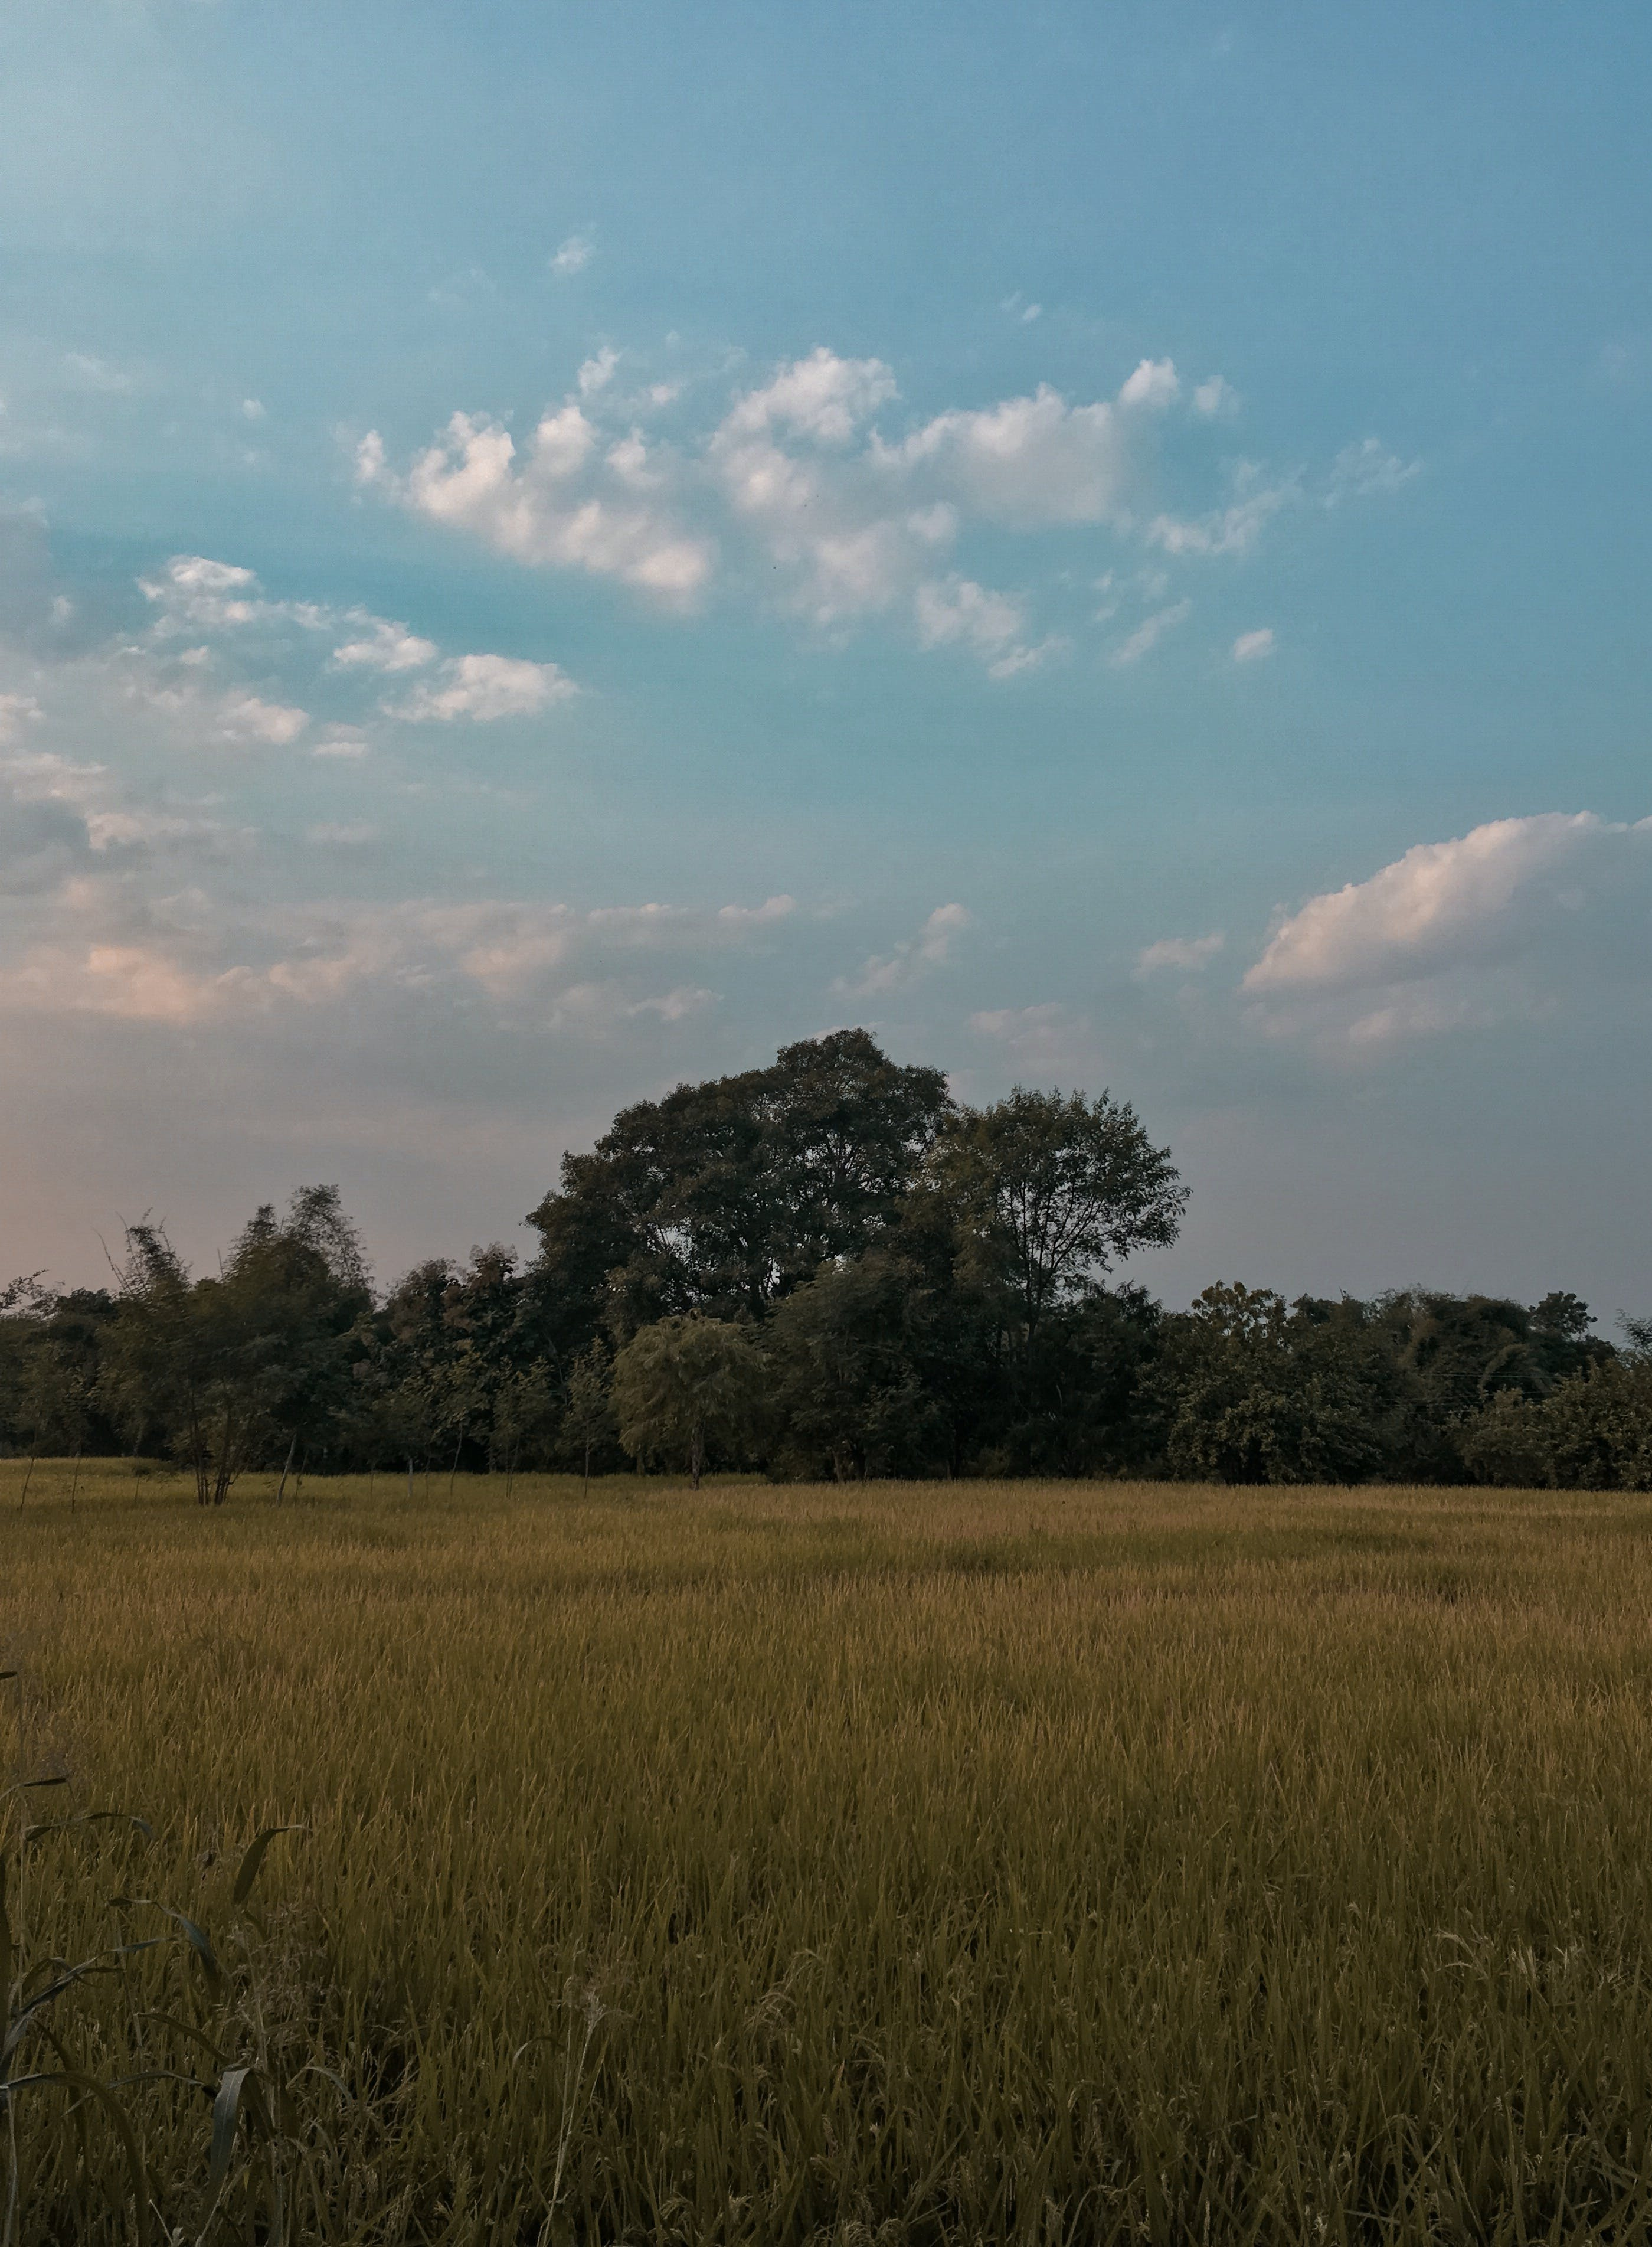 Free stock photo of farm, landscape, tree